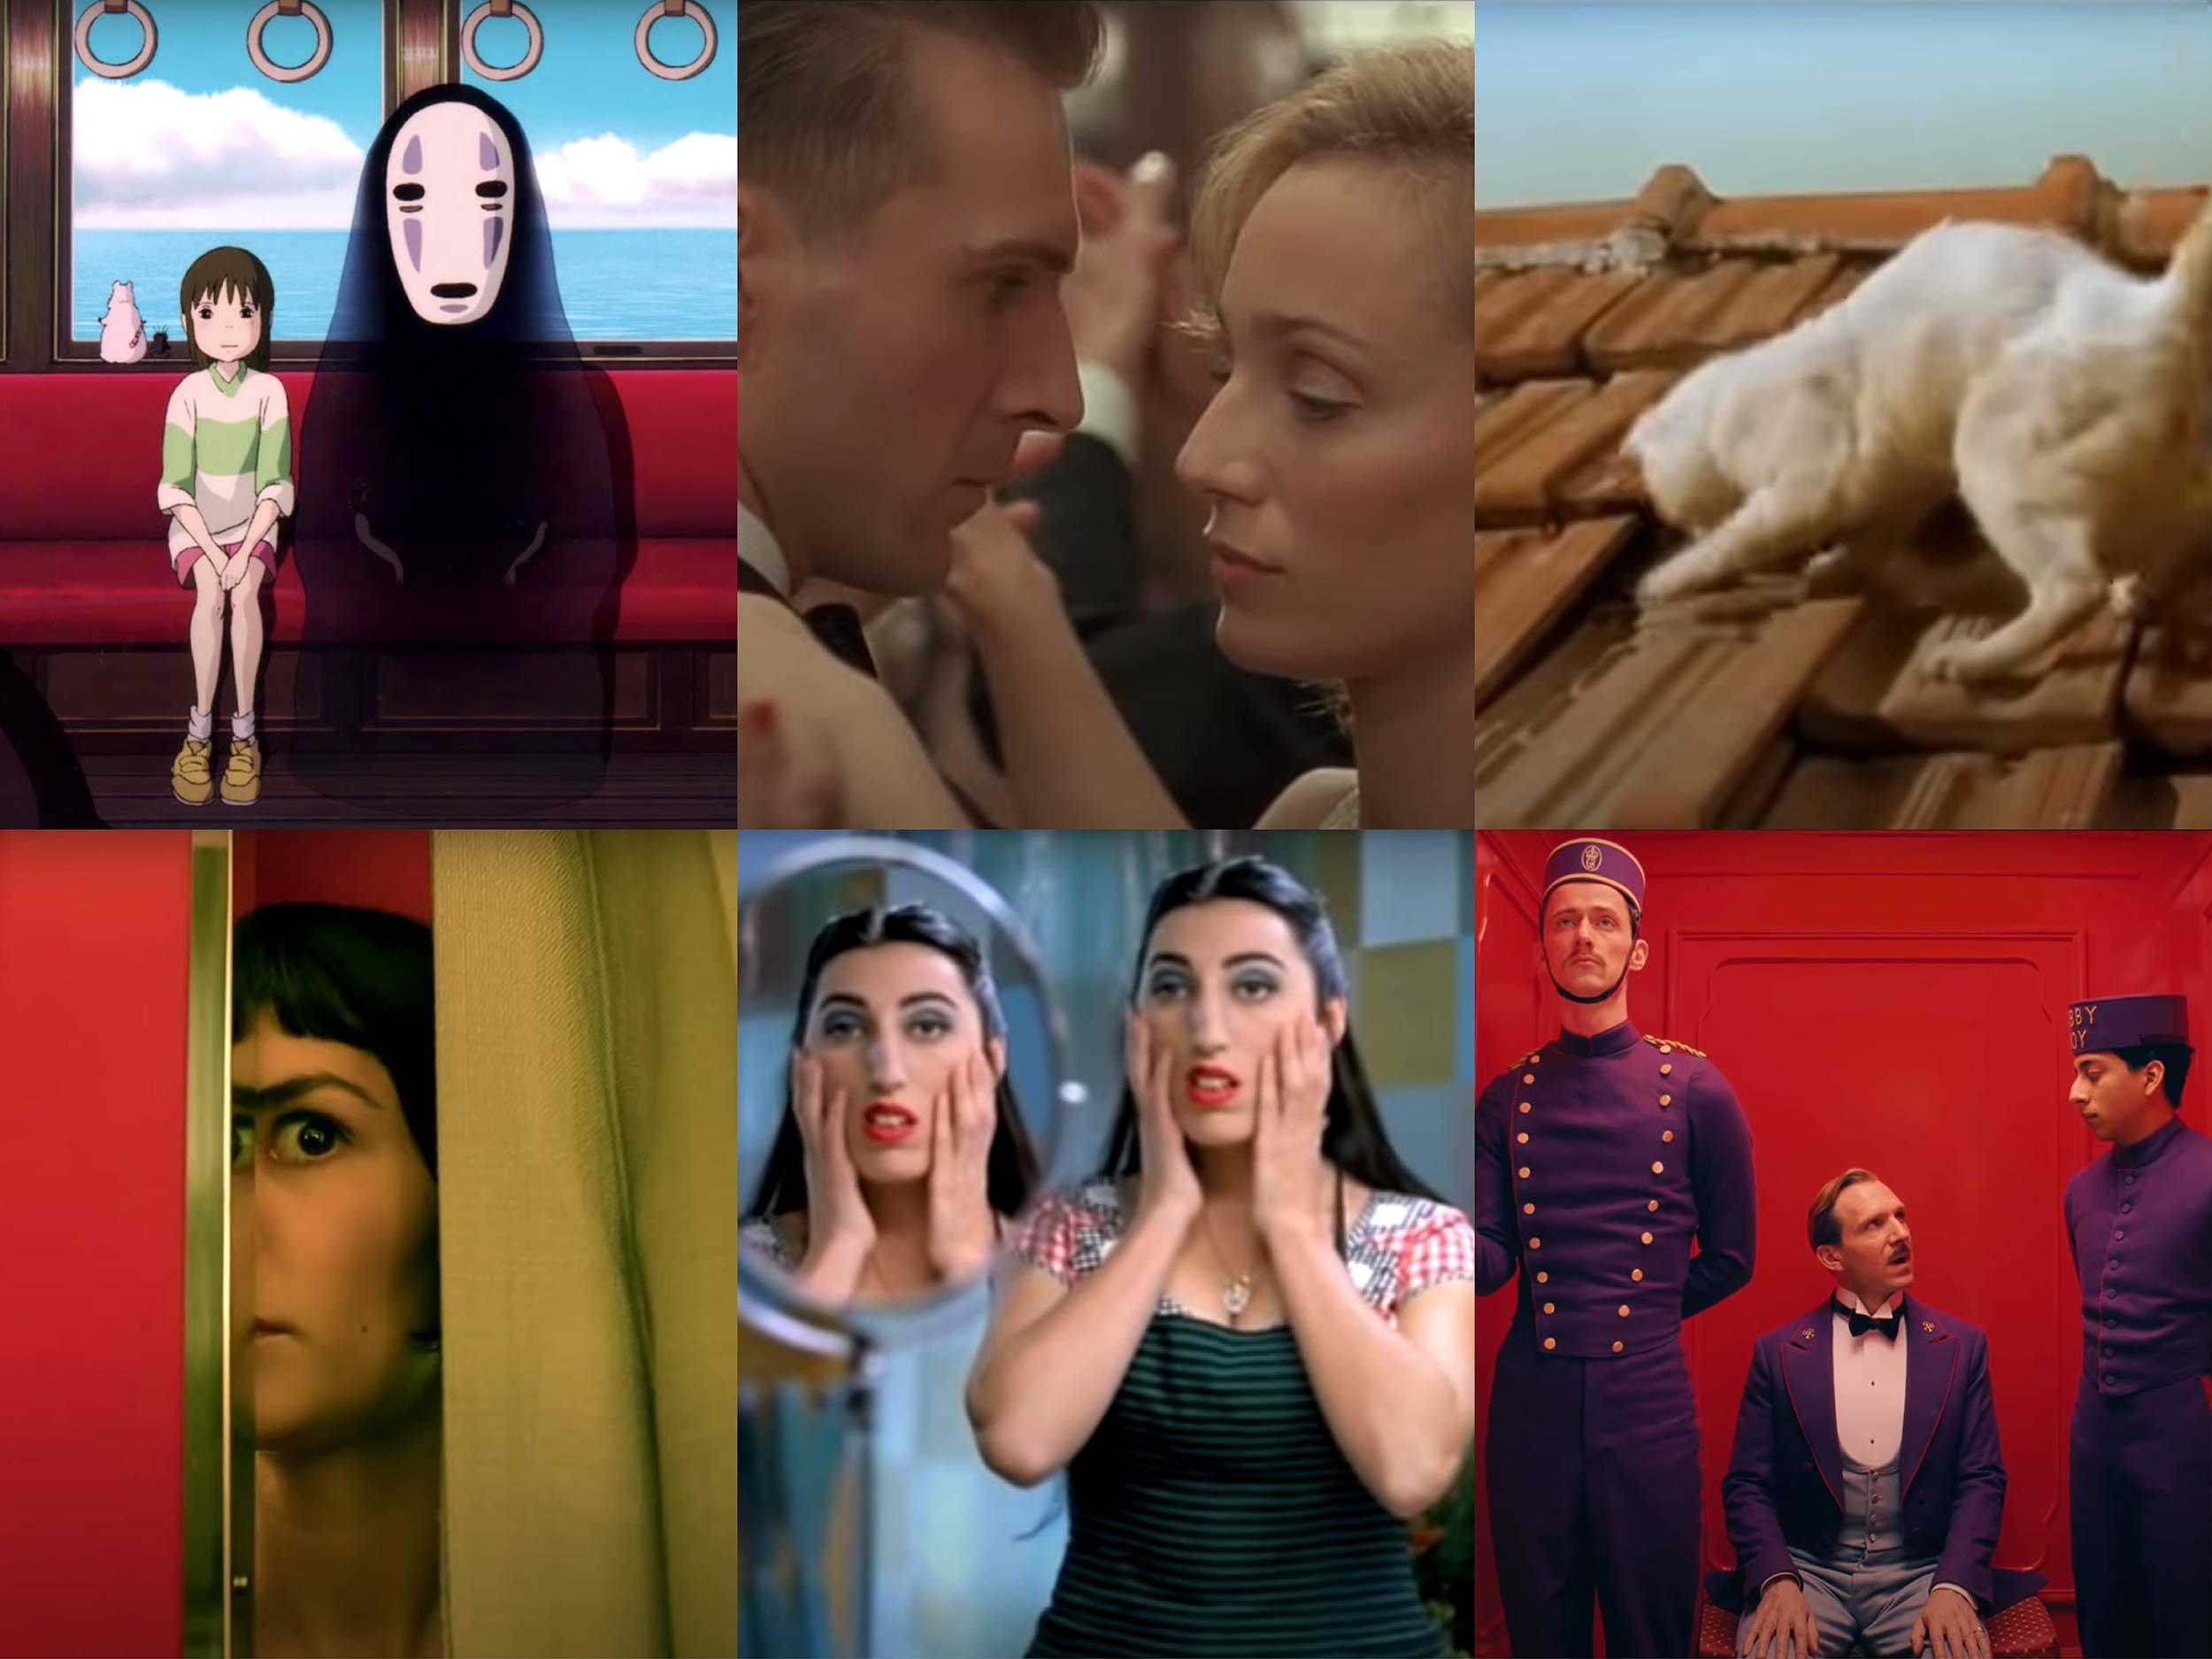 Belgian designer Christian Wijnants revisits his favorite films during lockdown